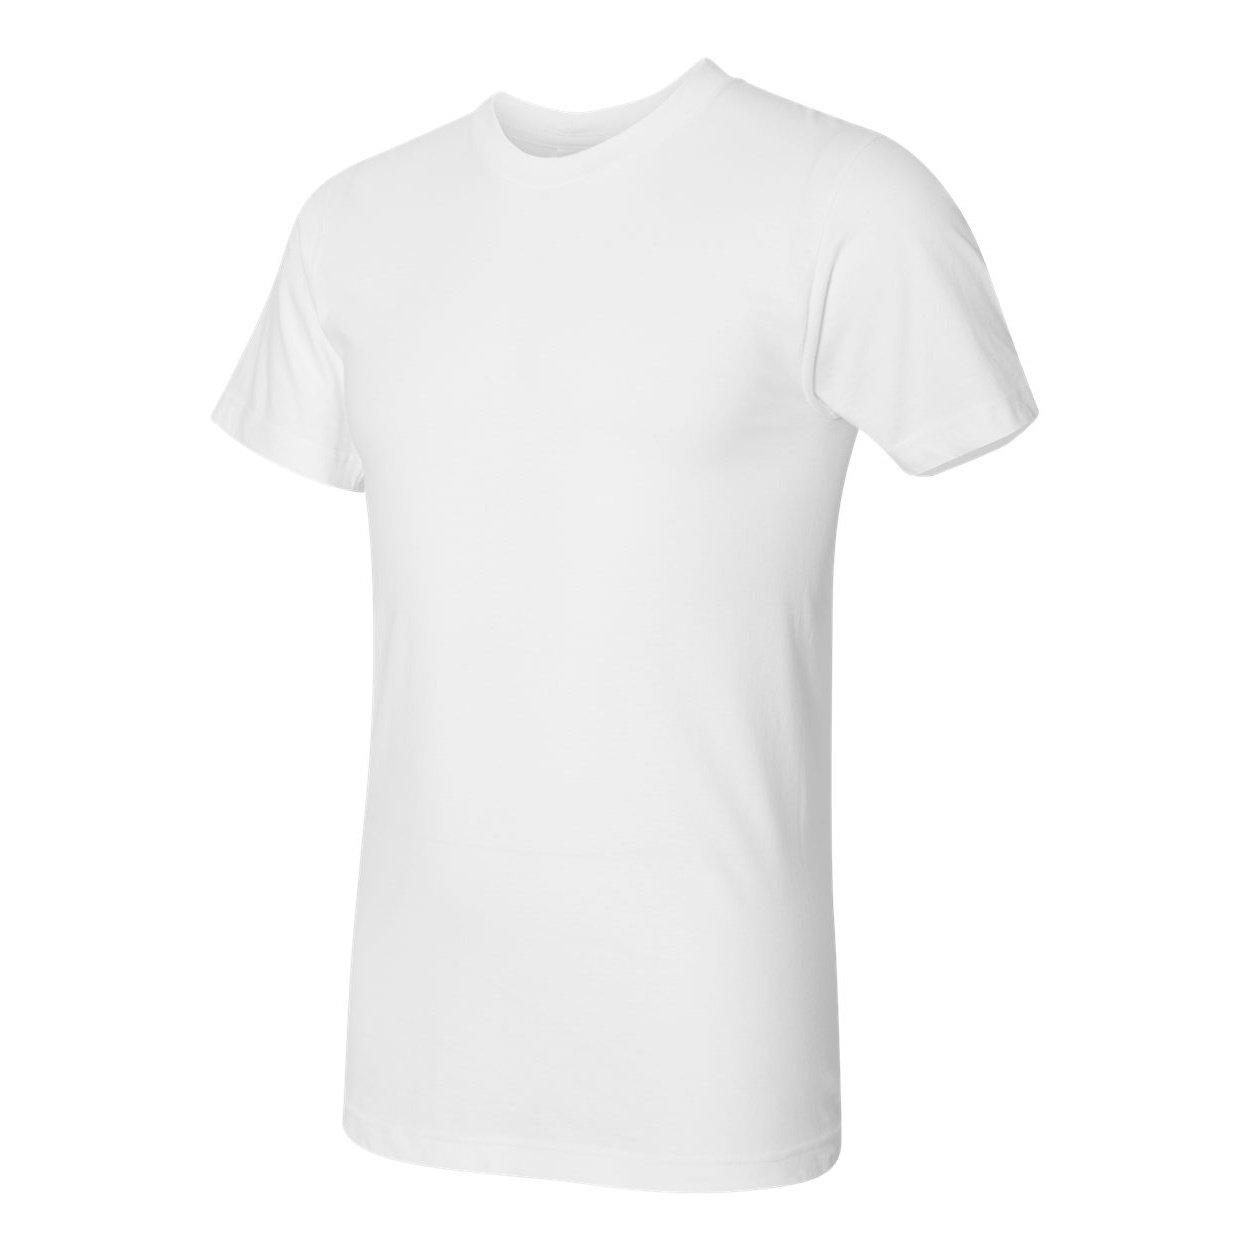 American Apparel Mens Fine Jersey Tee (2XL) (White)